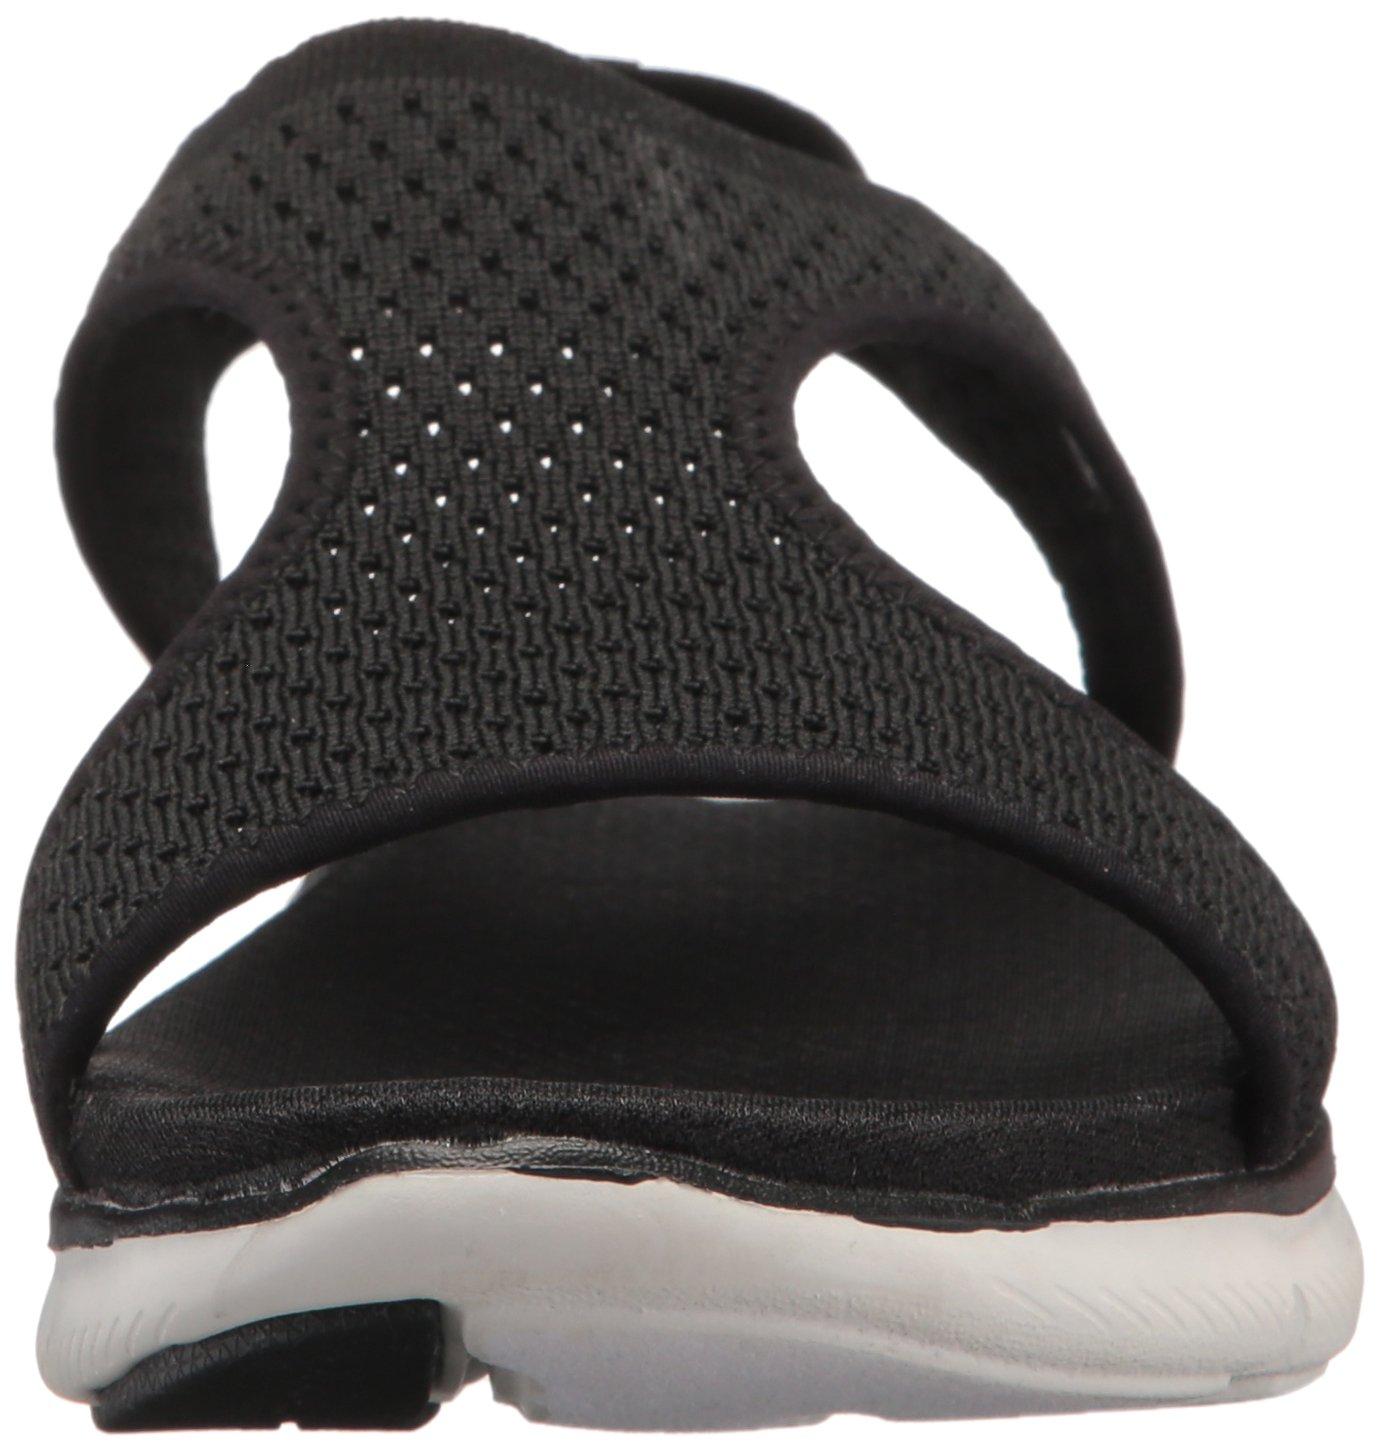 Skechers Sandal Women's Flex Appeal 2.0-Deja Vu Sport Sandal Skechers B0755VPXPJ 9 M US|Black 78d564